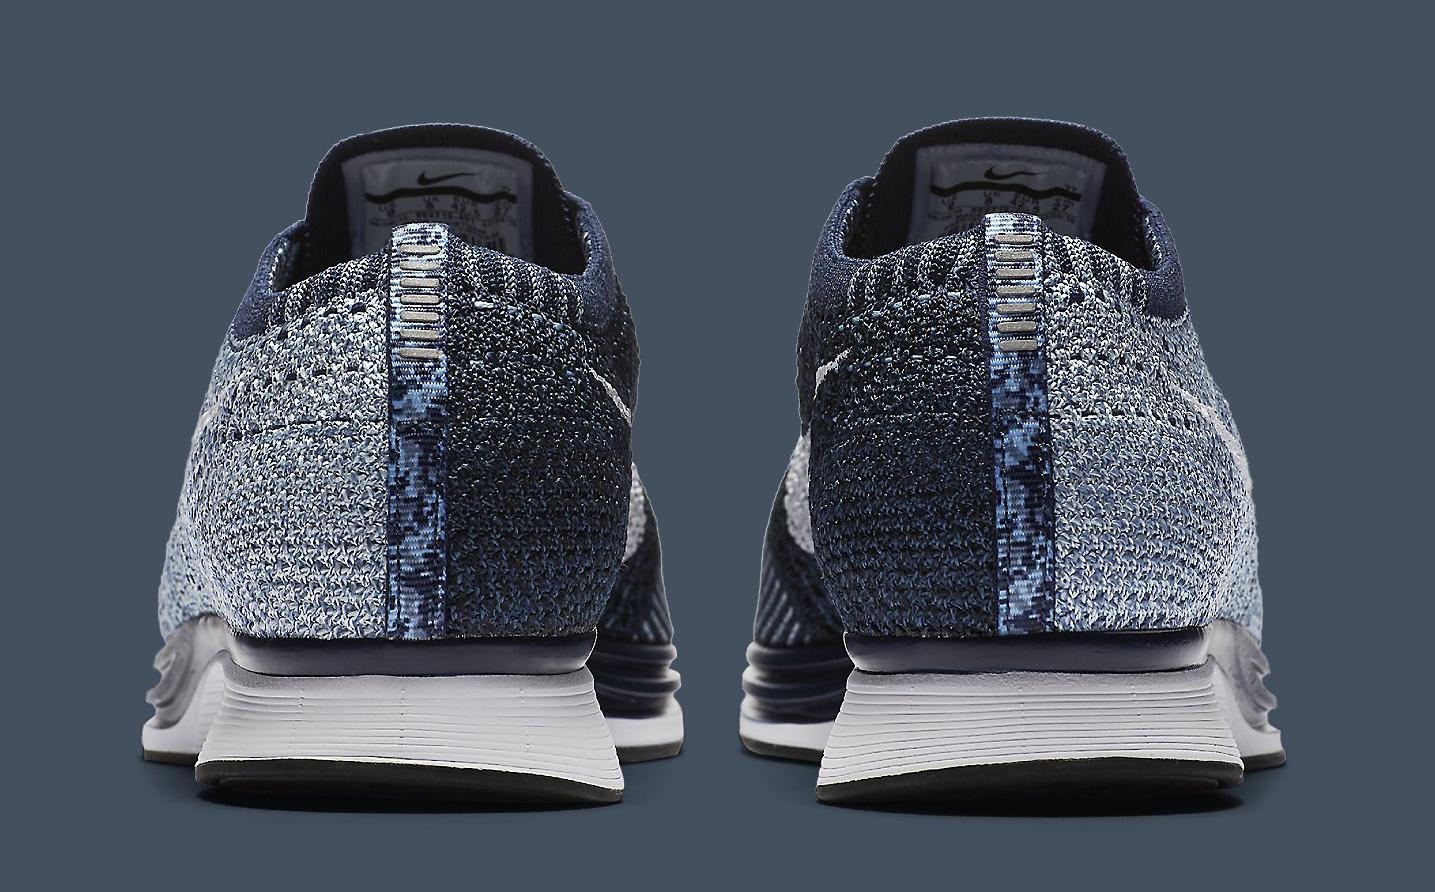 online retailer c3e59 719af Image via Nike Nike Flyknit Racer Blue Tint White 862713-401 Heel